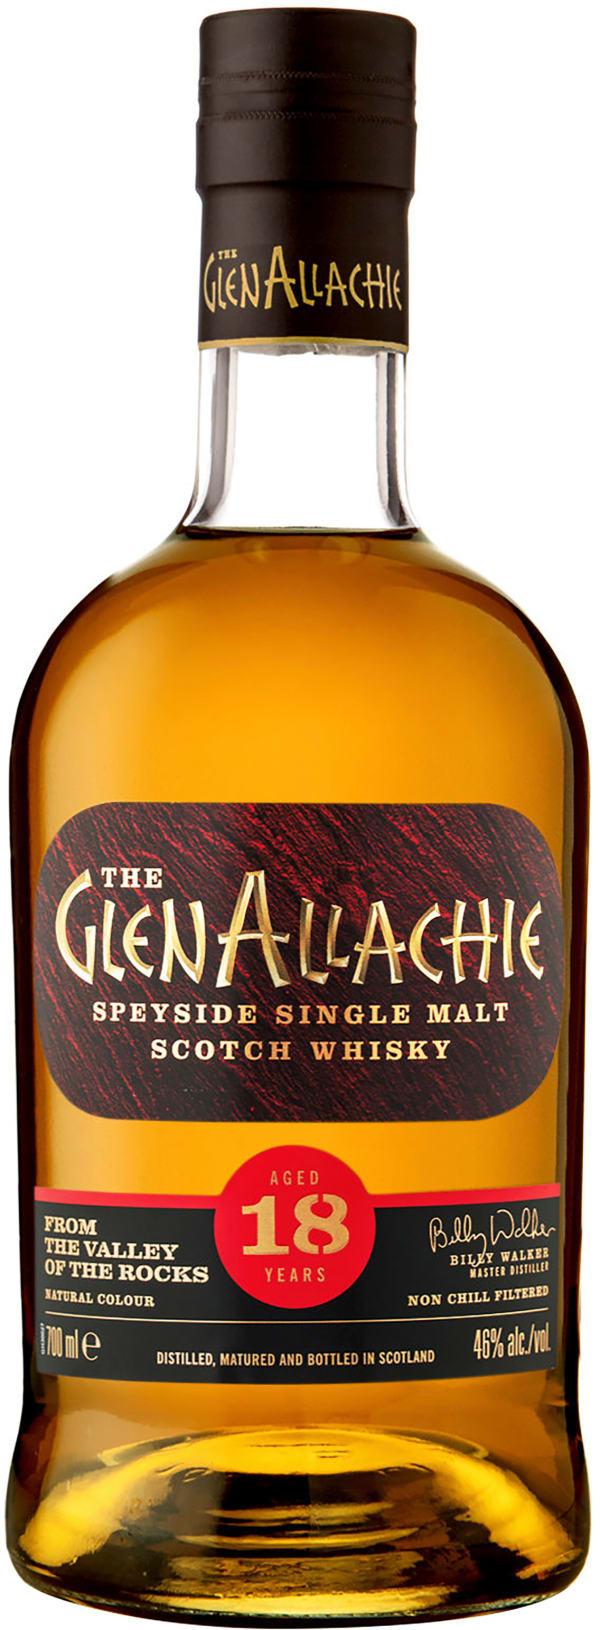 GlenAllachie 18 Year Old Single Malt